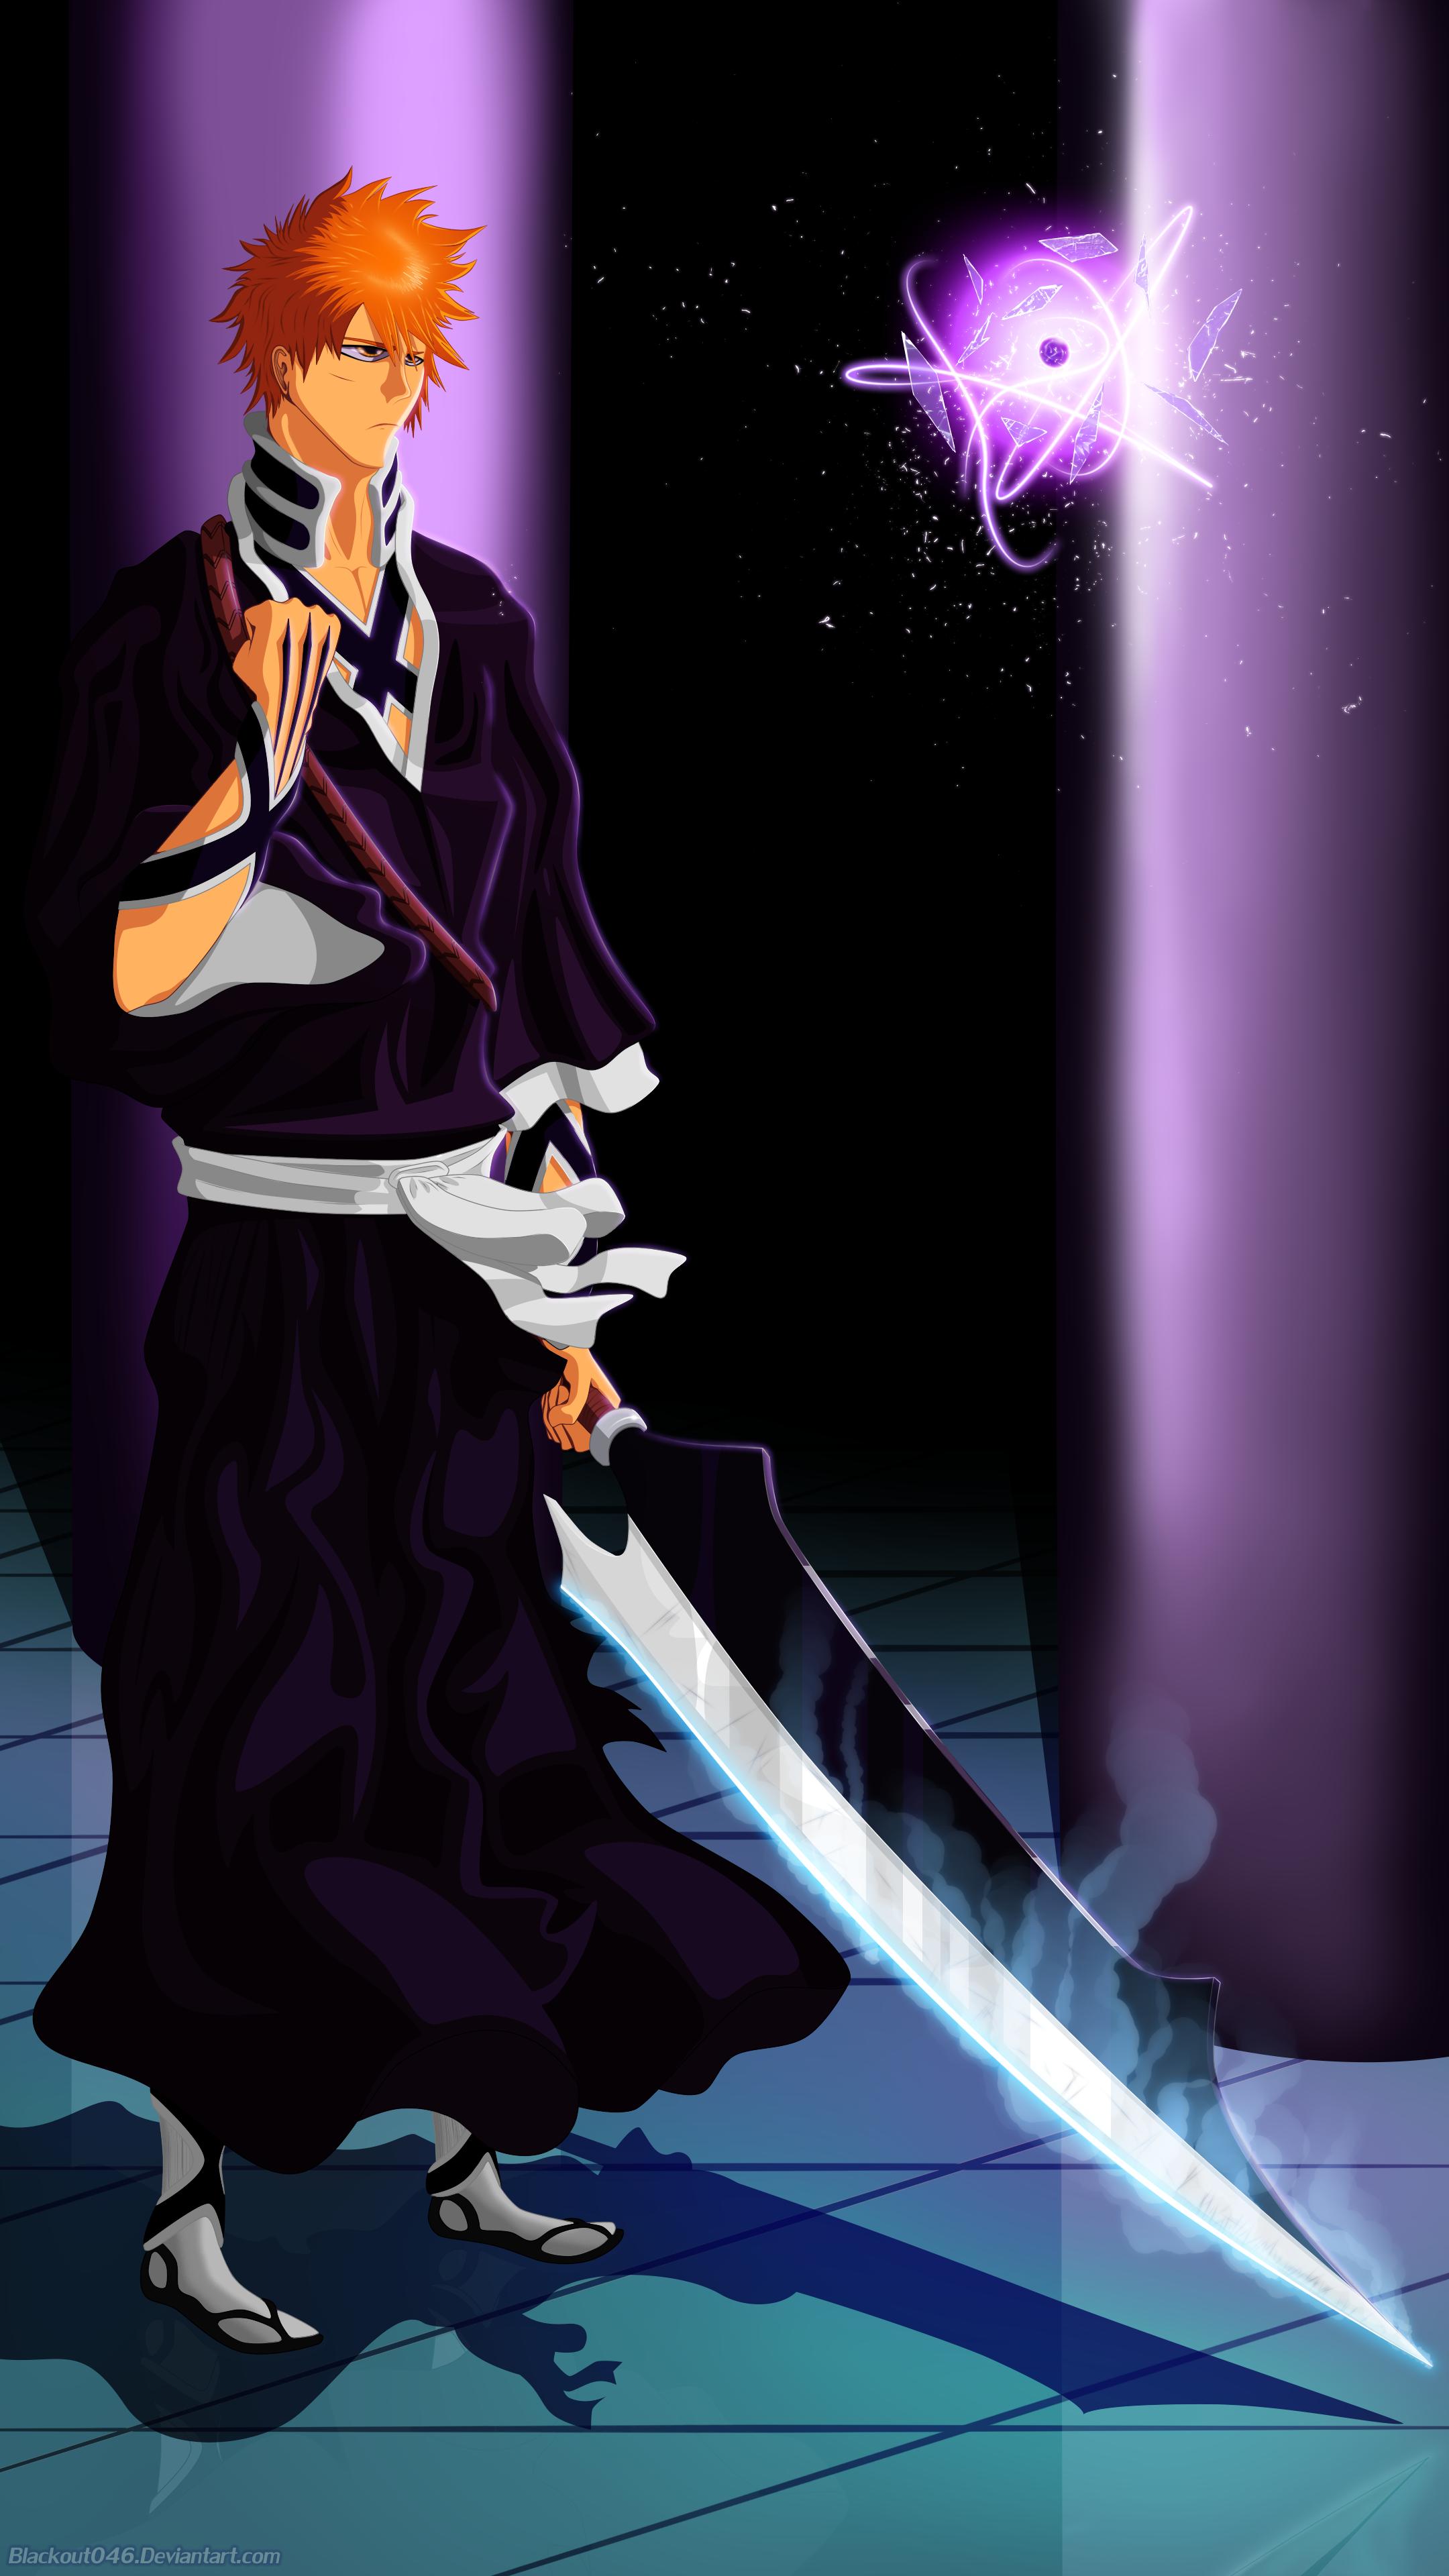 Shatter the Hogyoku, Kurosaki Ichigo! by Blackout046 on ...